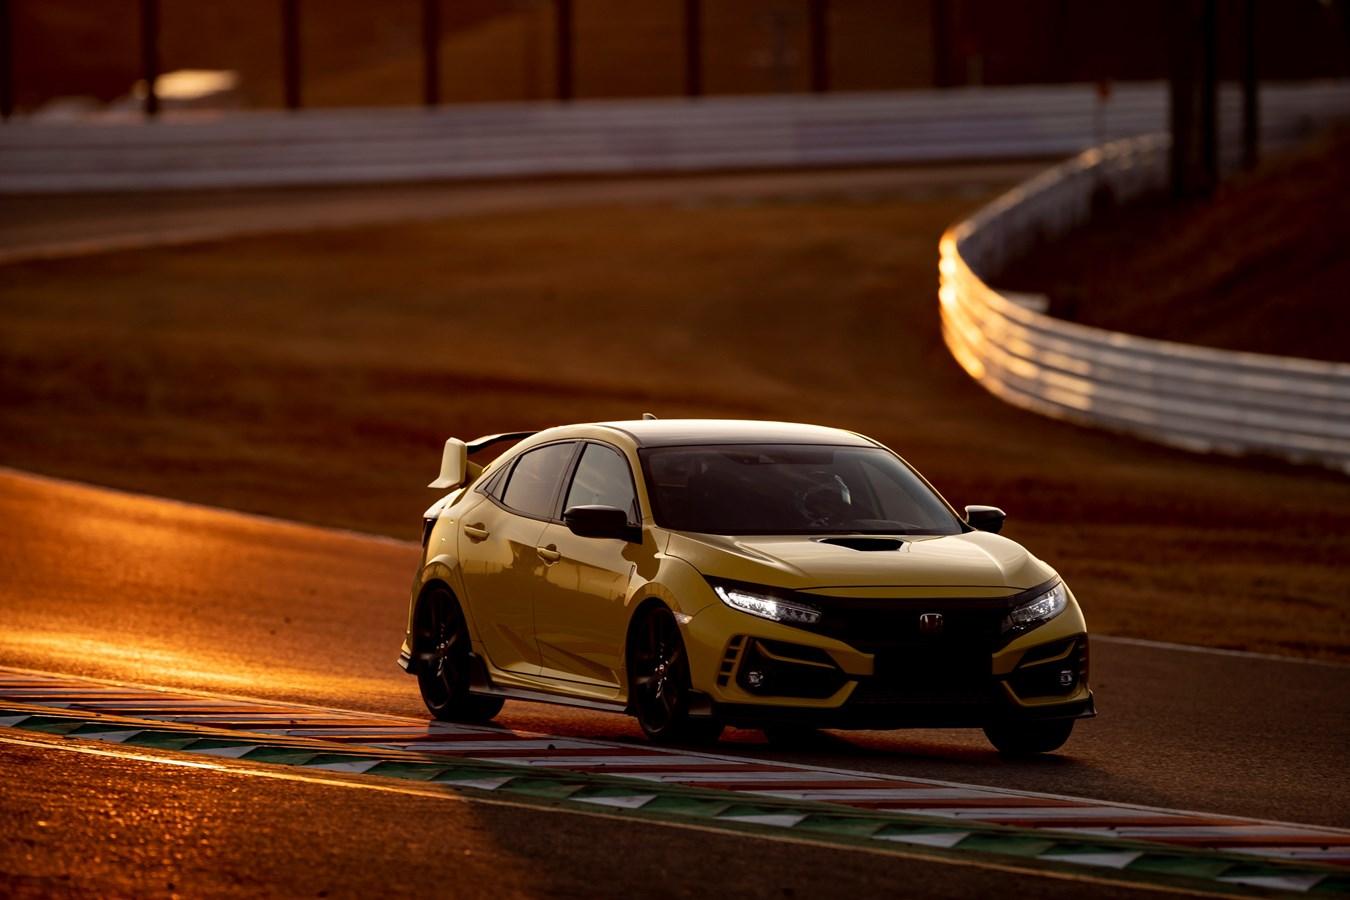 Honda Civic Type R Limited Edition estabelece novo recorde de volta mais rápida no emblemático Circuito de Suzuka